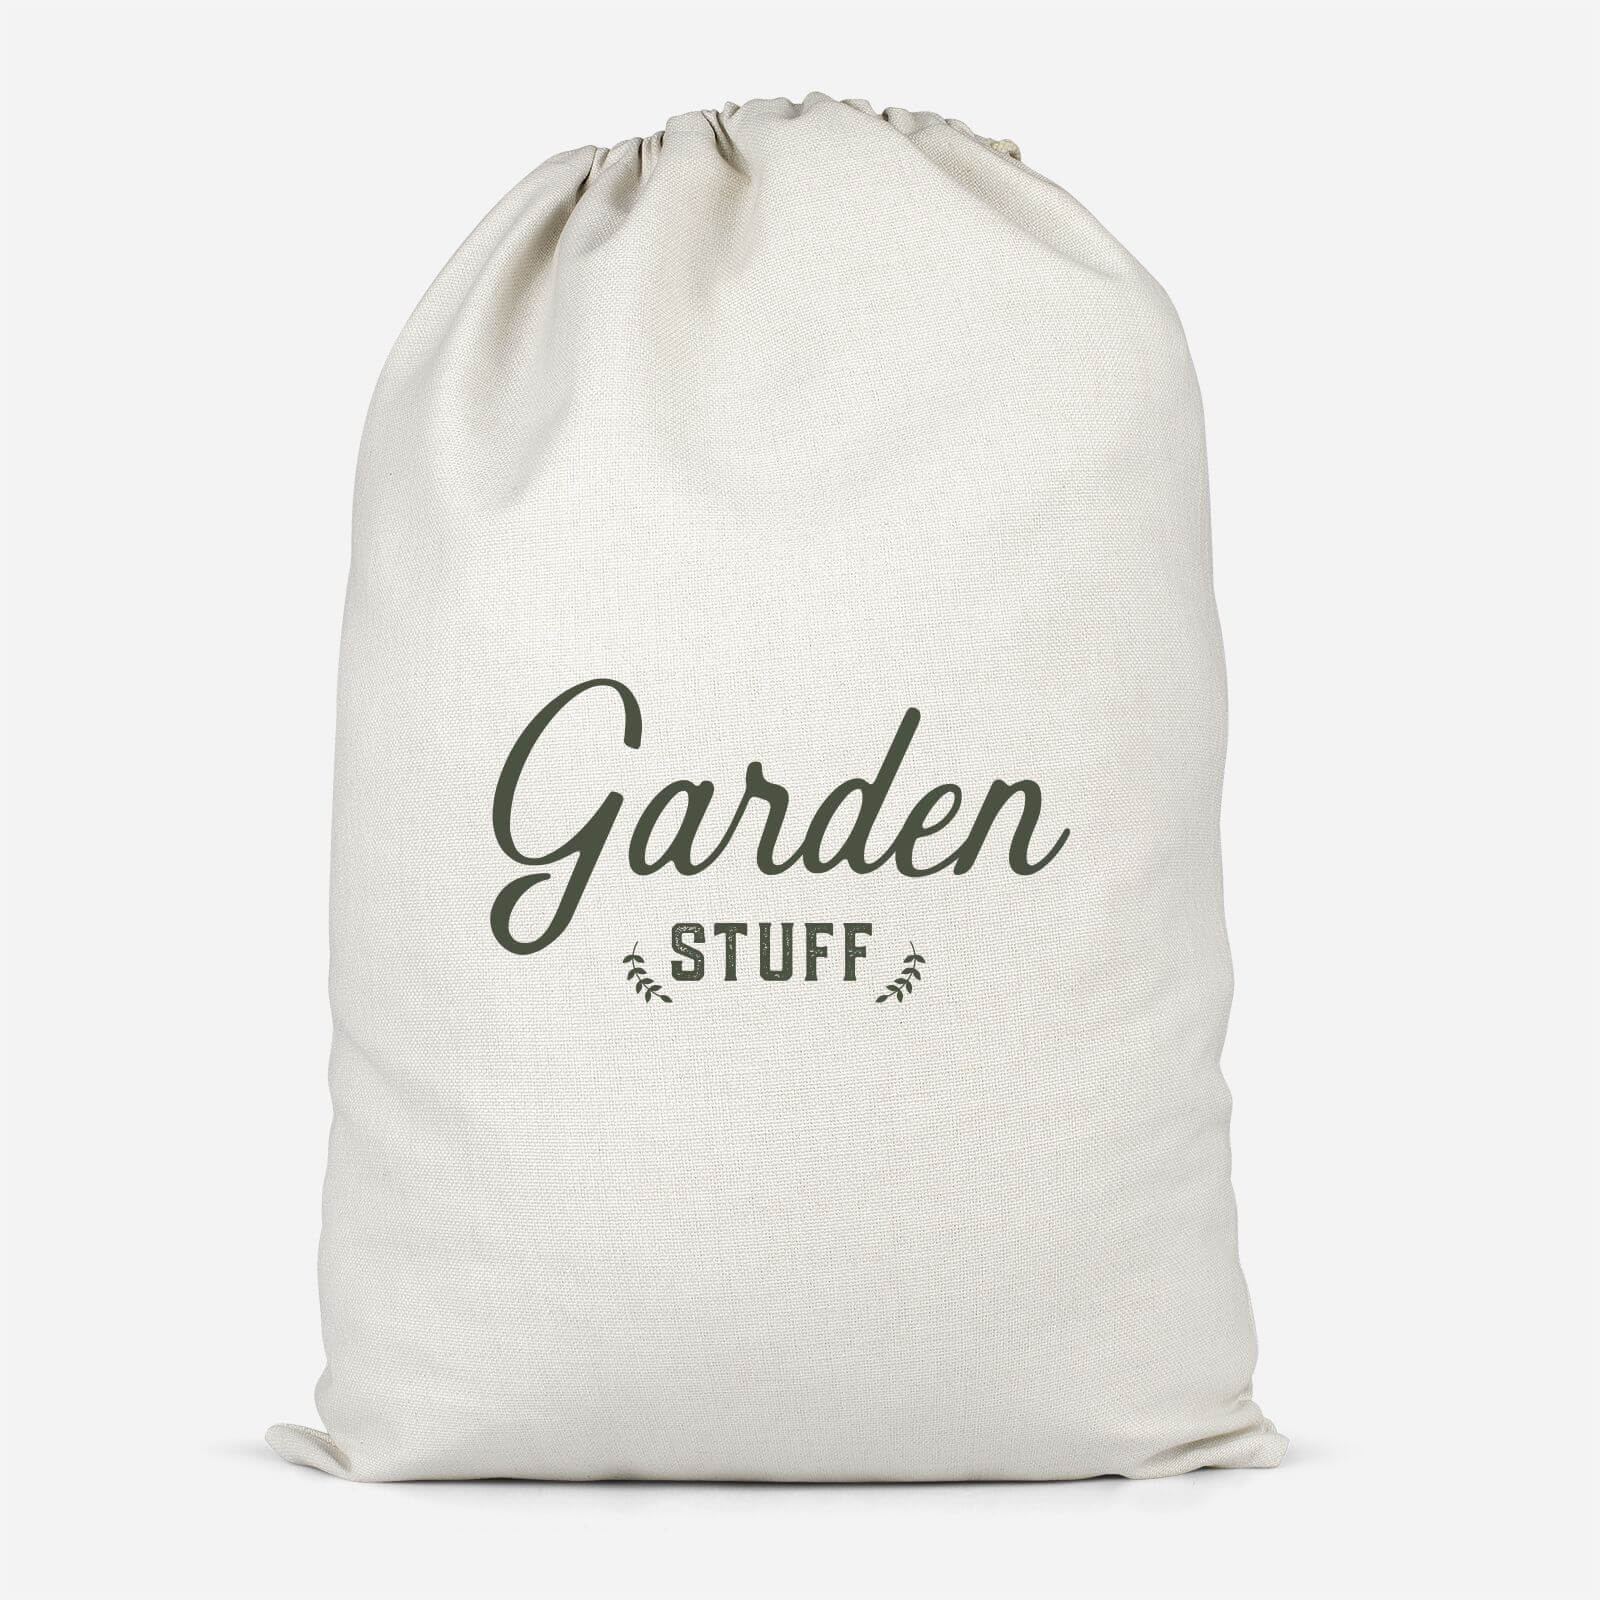 Garden Stuff Cotton Storage Bag   Small